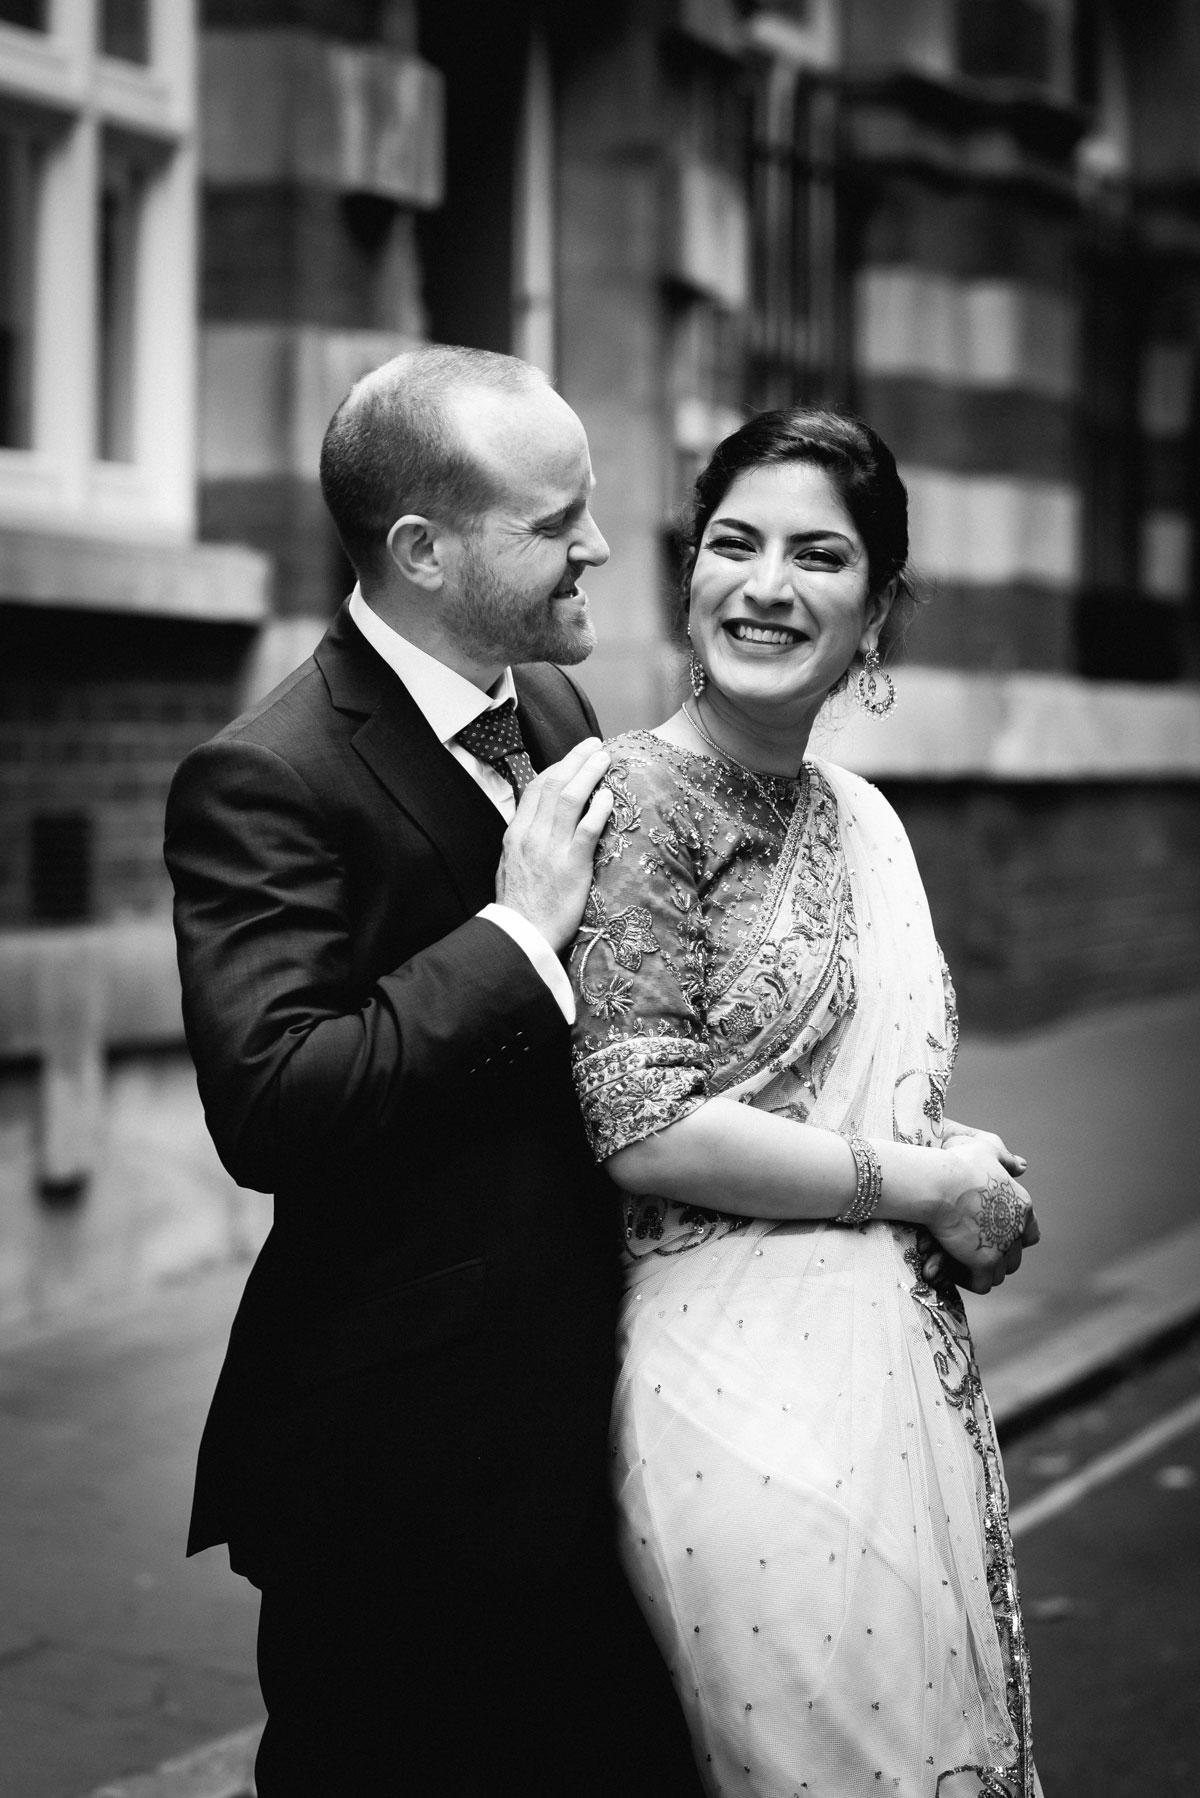 wedding-at-st-brides-0014